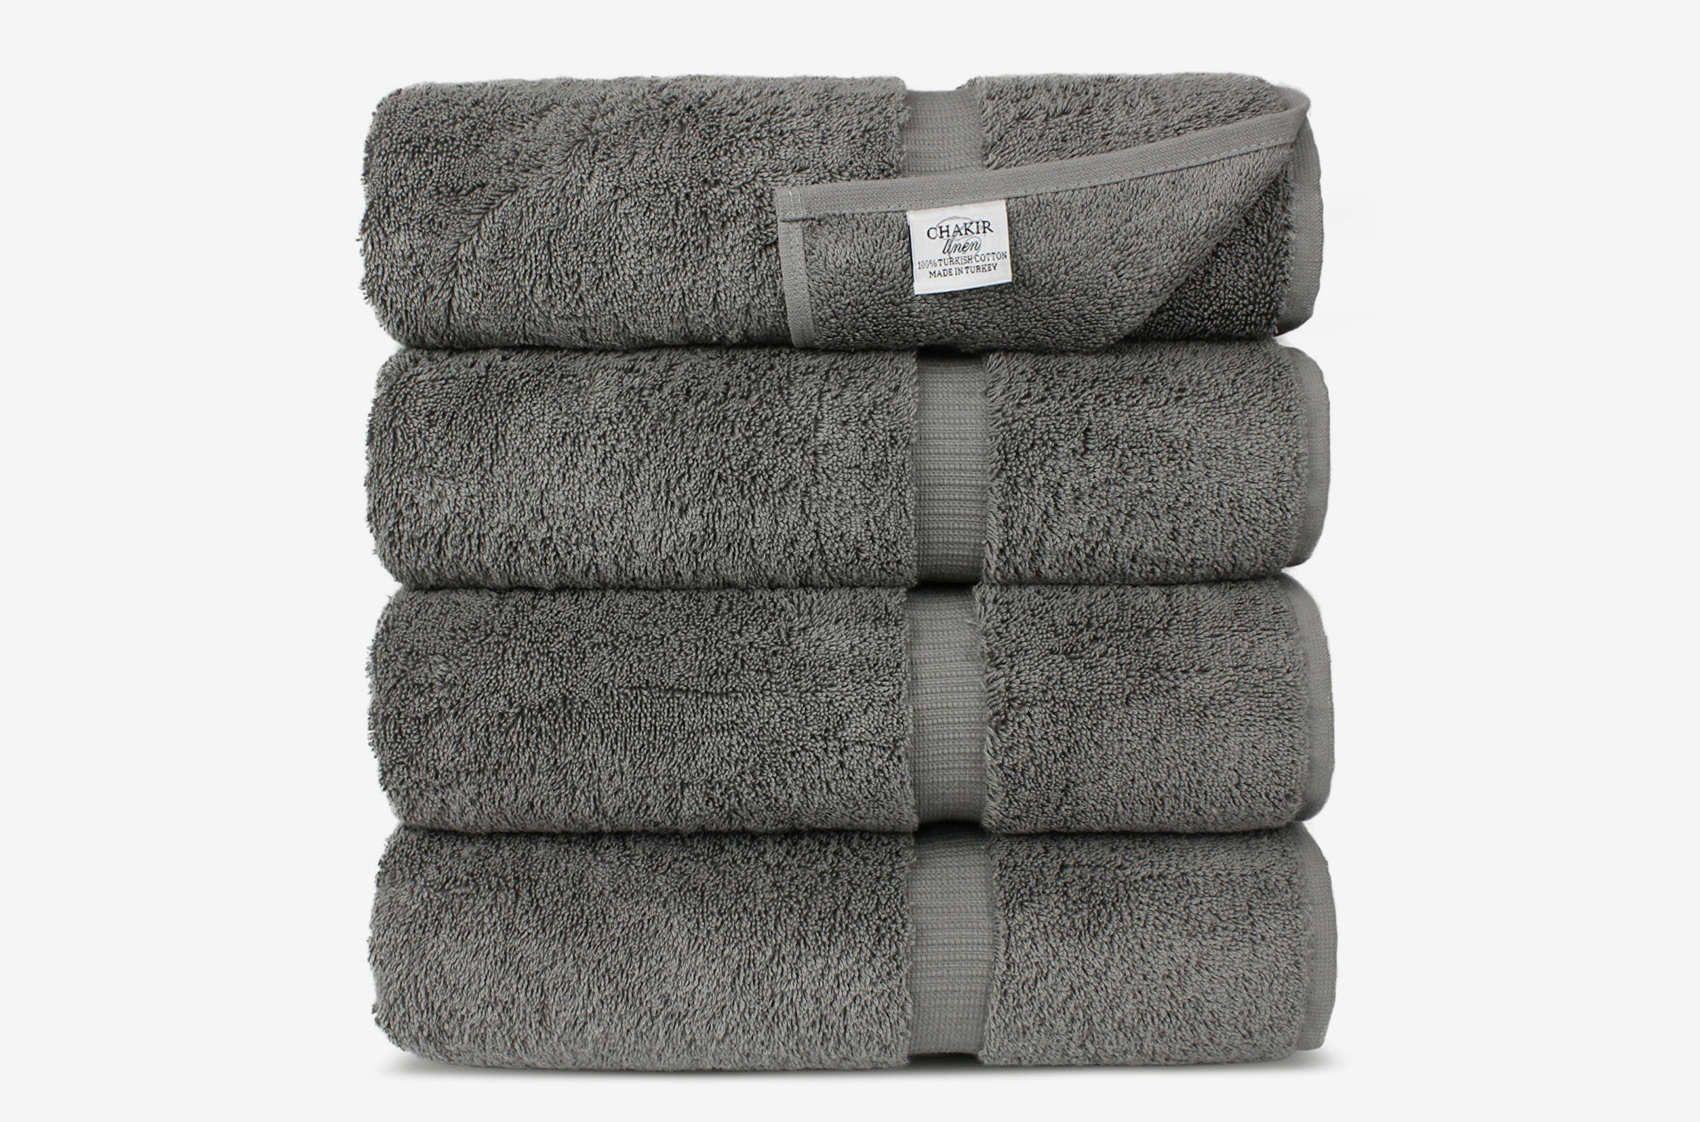 Chakir Turkish Cotton Luxury Hotel Spa Bath Towel Set Of 4